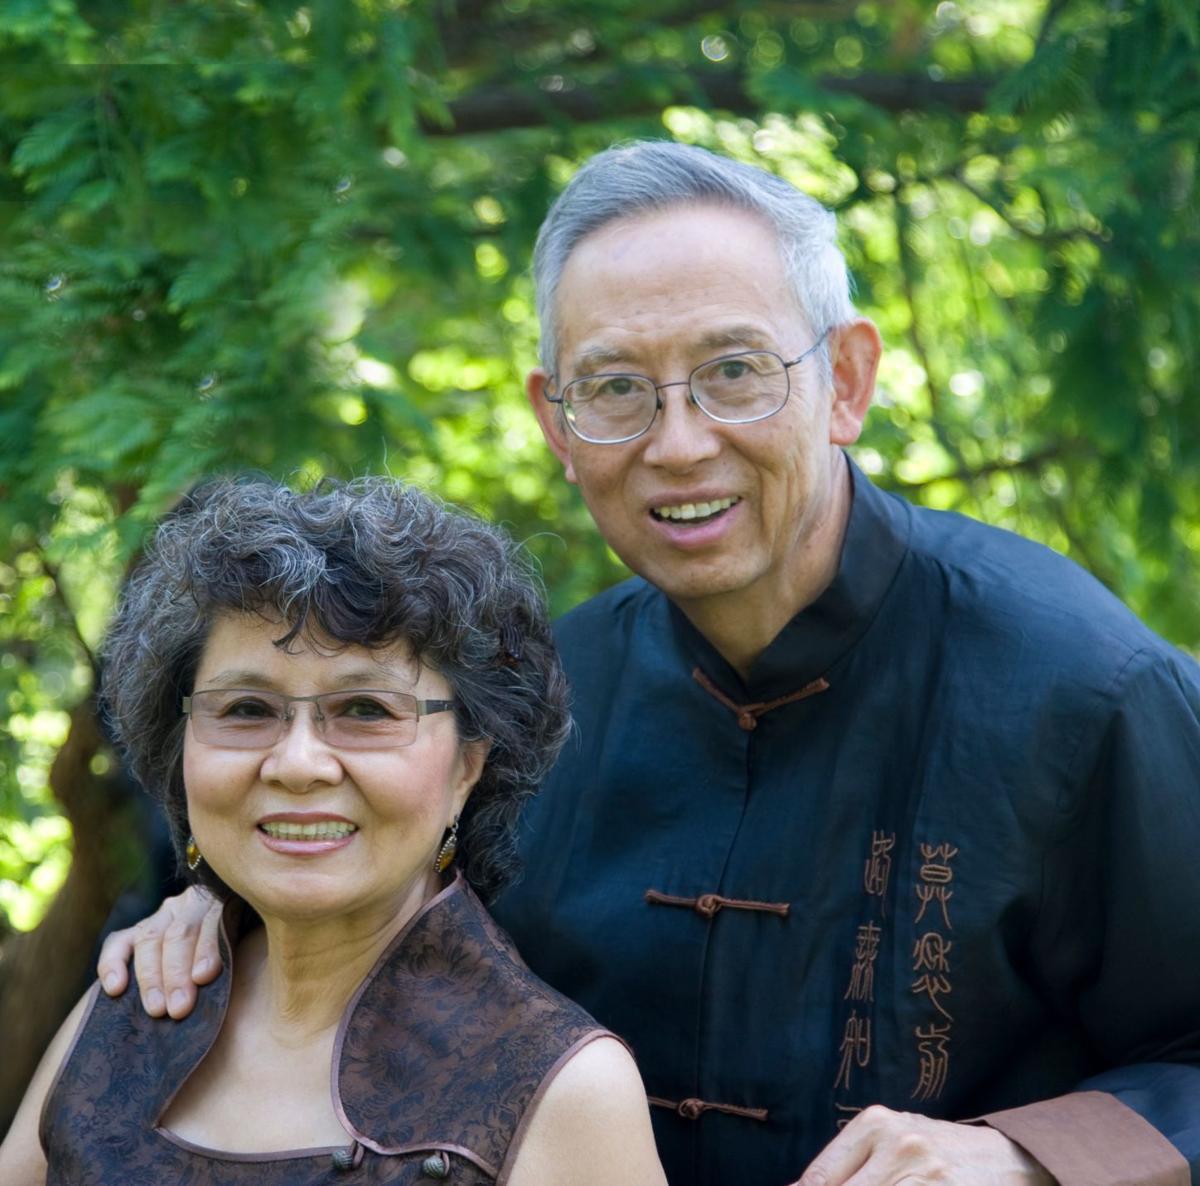 Leon and Angela Yuan